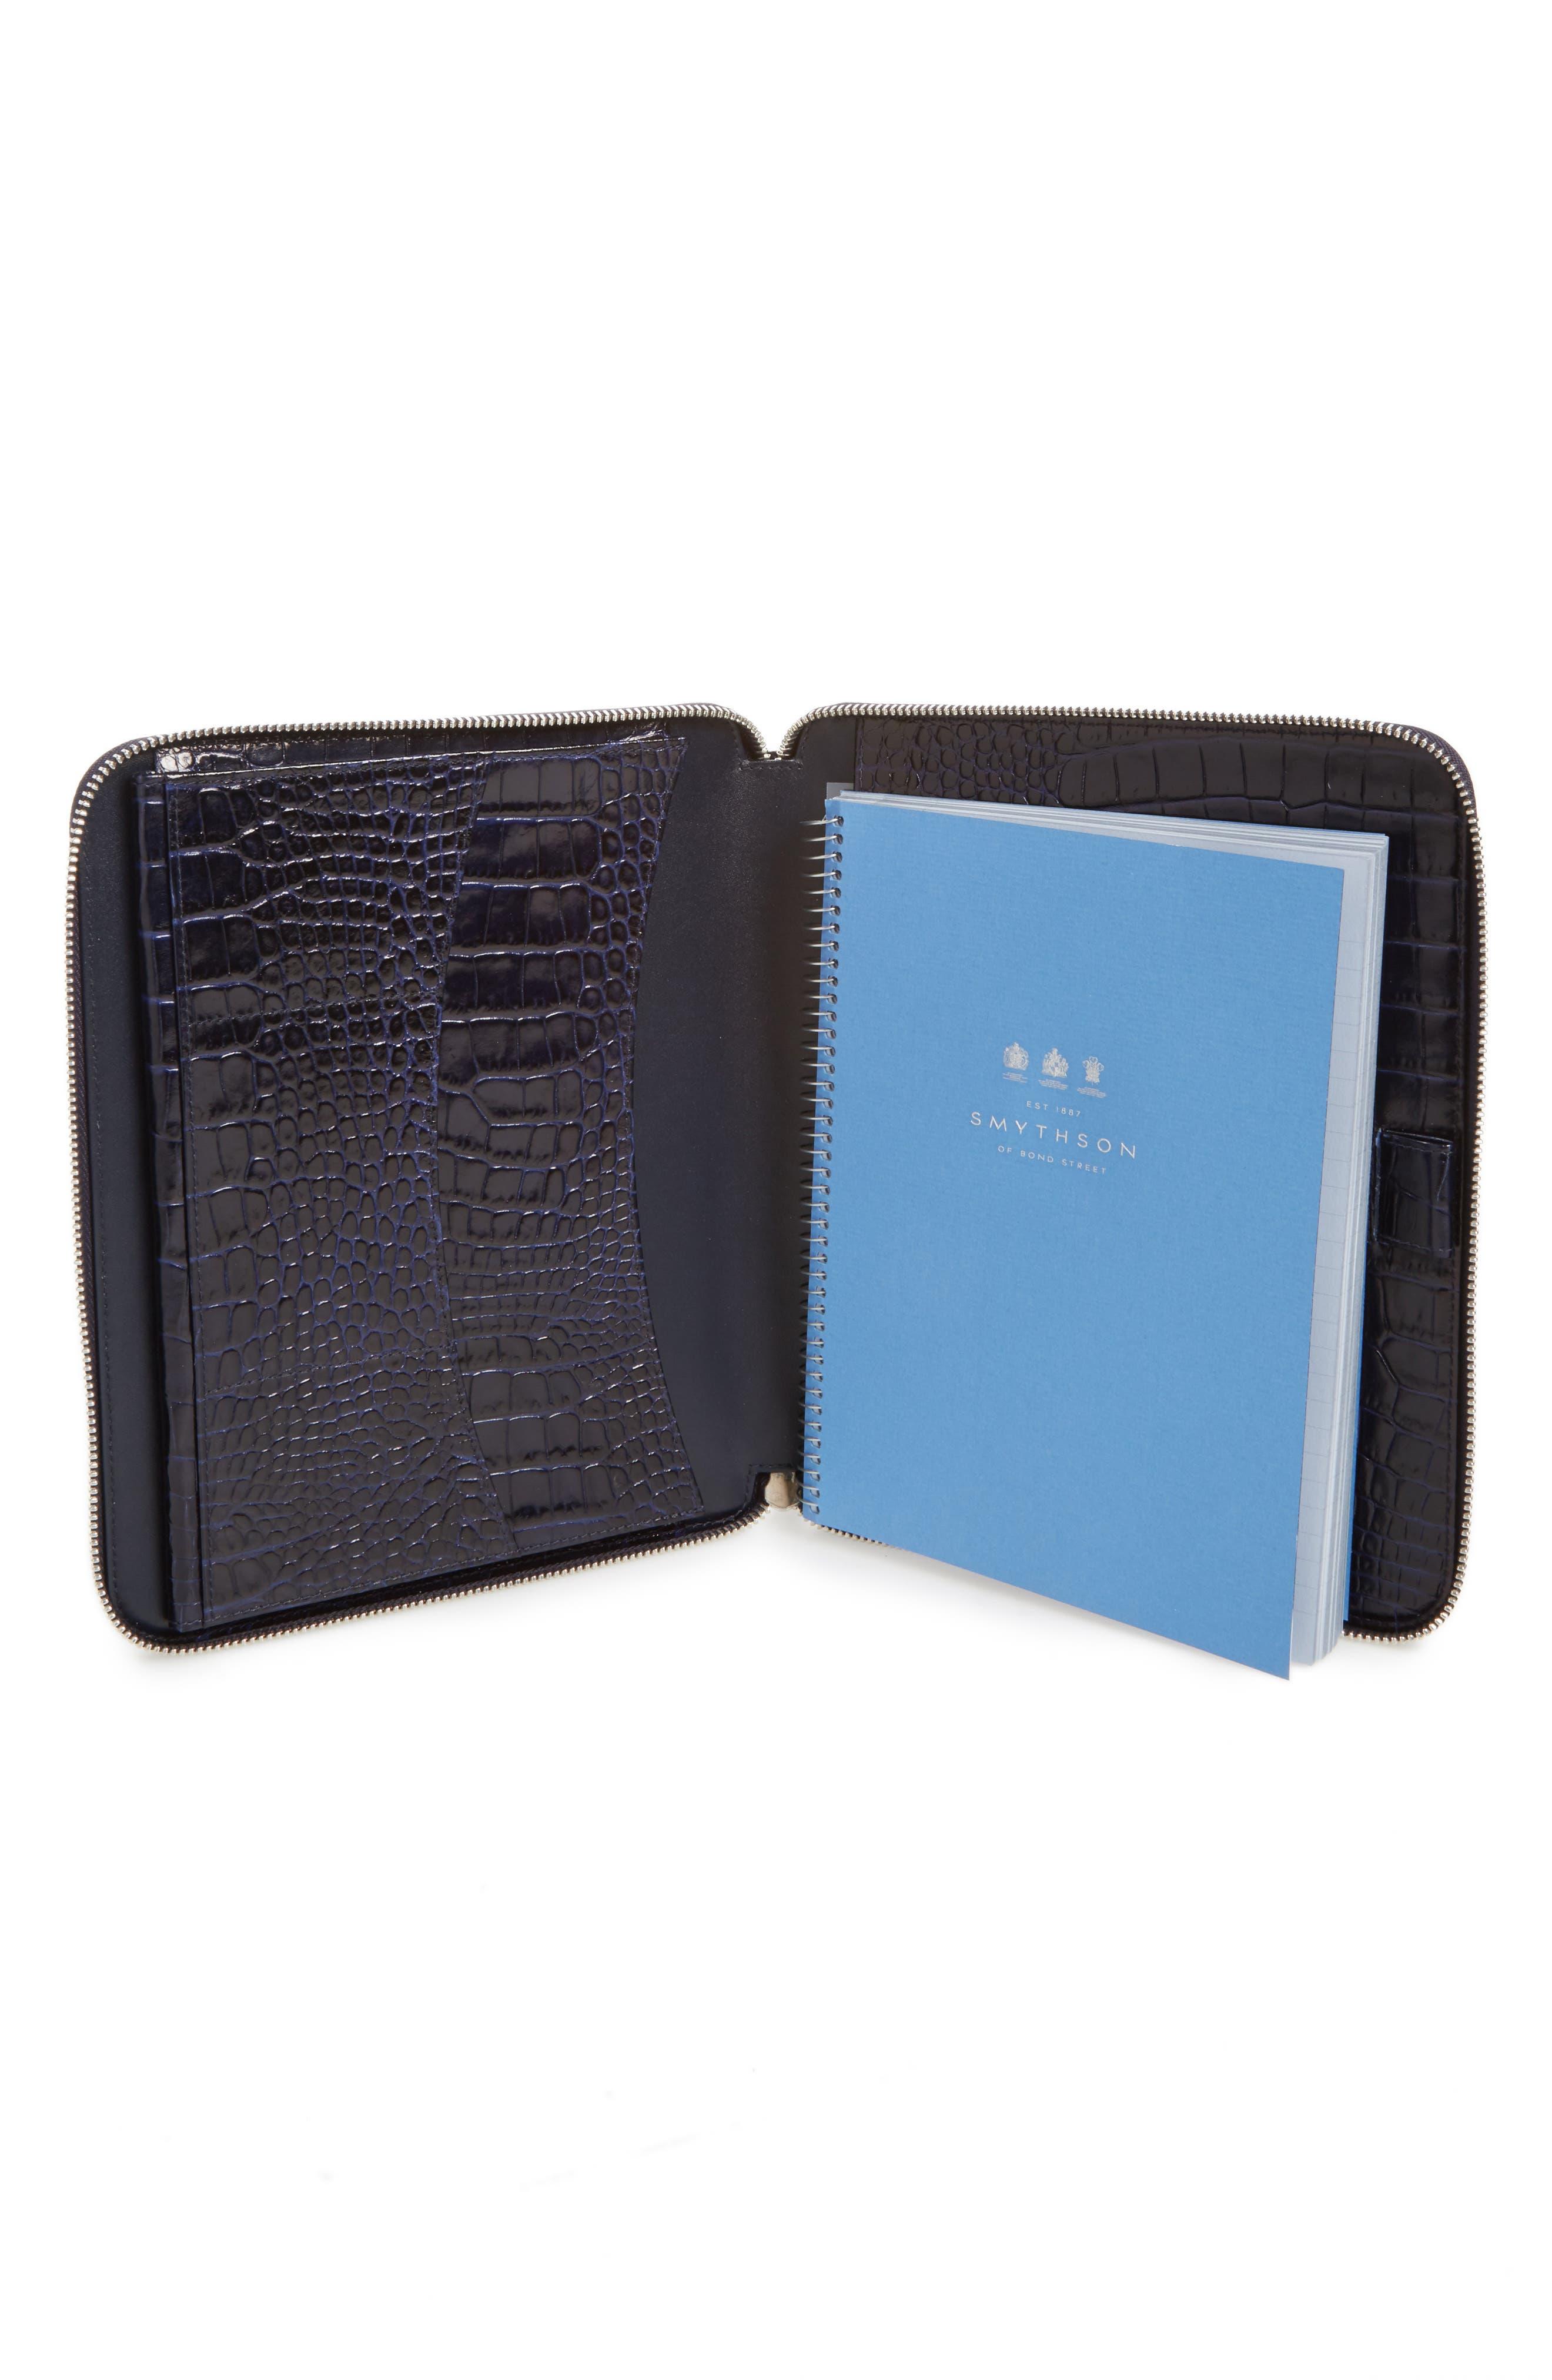 SMYTHSON Mara Croc Embossed Zip Folder & A5 Notebook - Blue JfuzYpfva